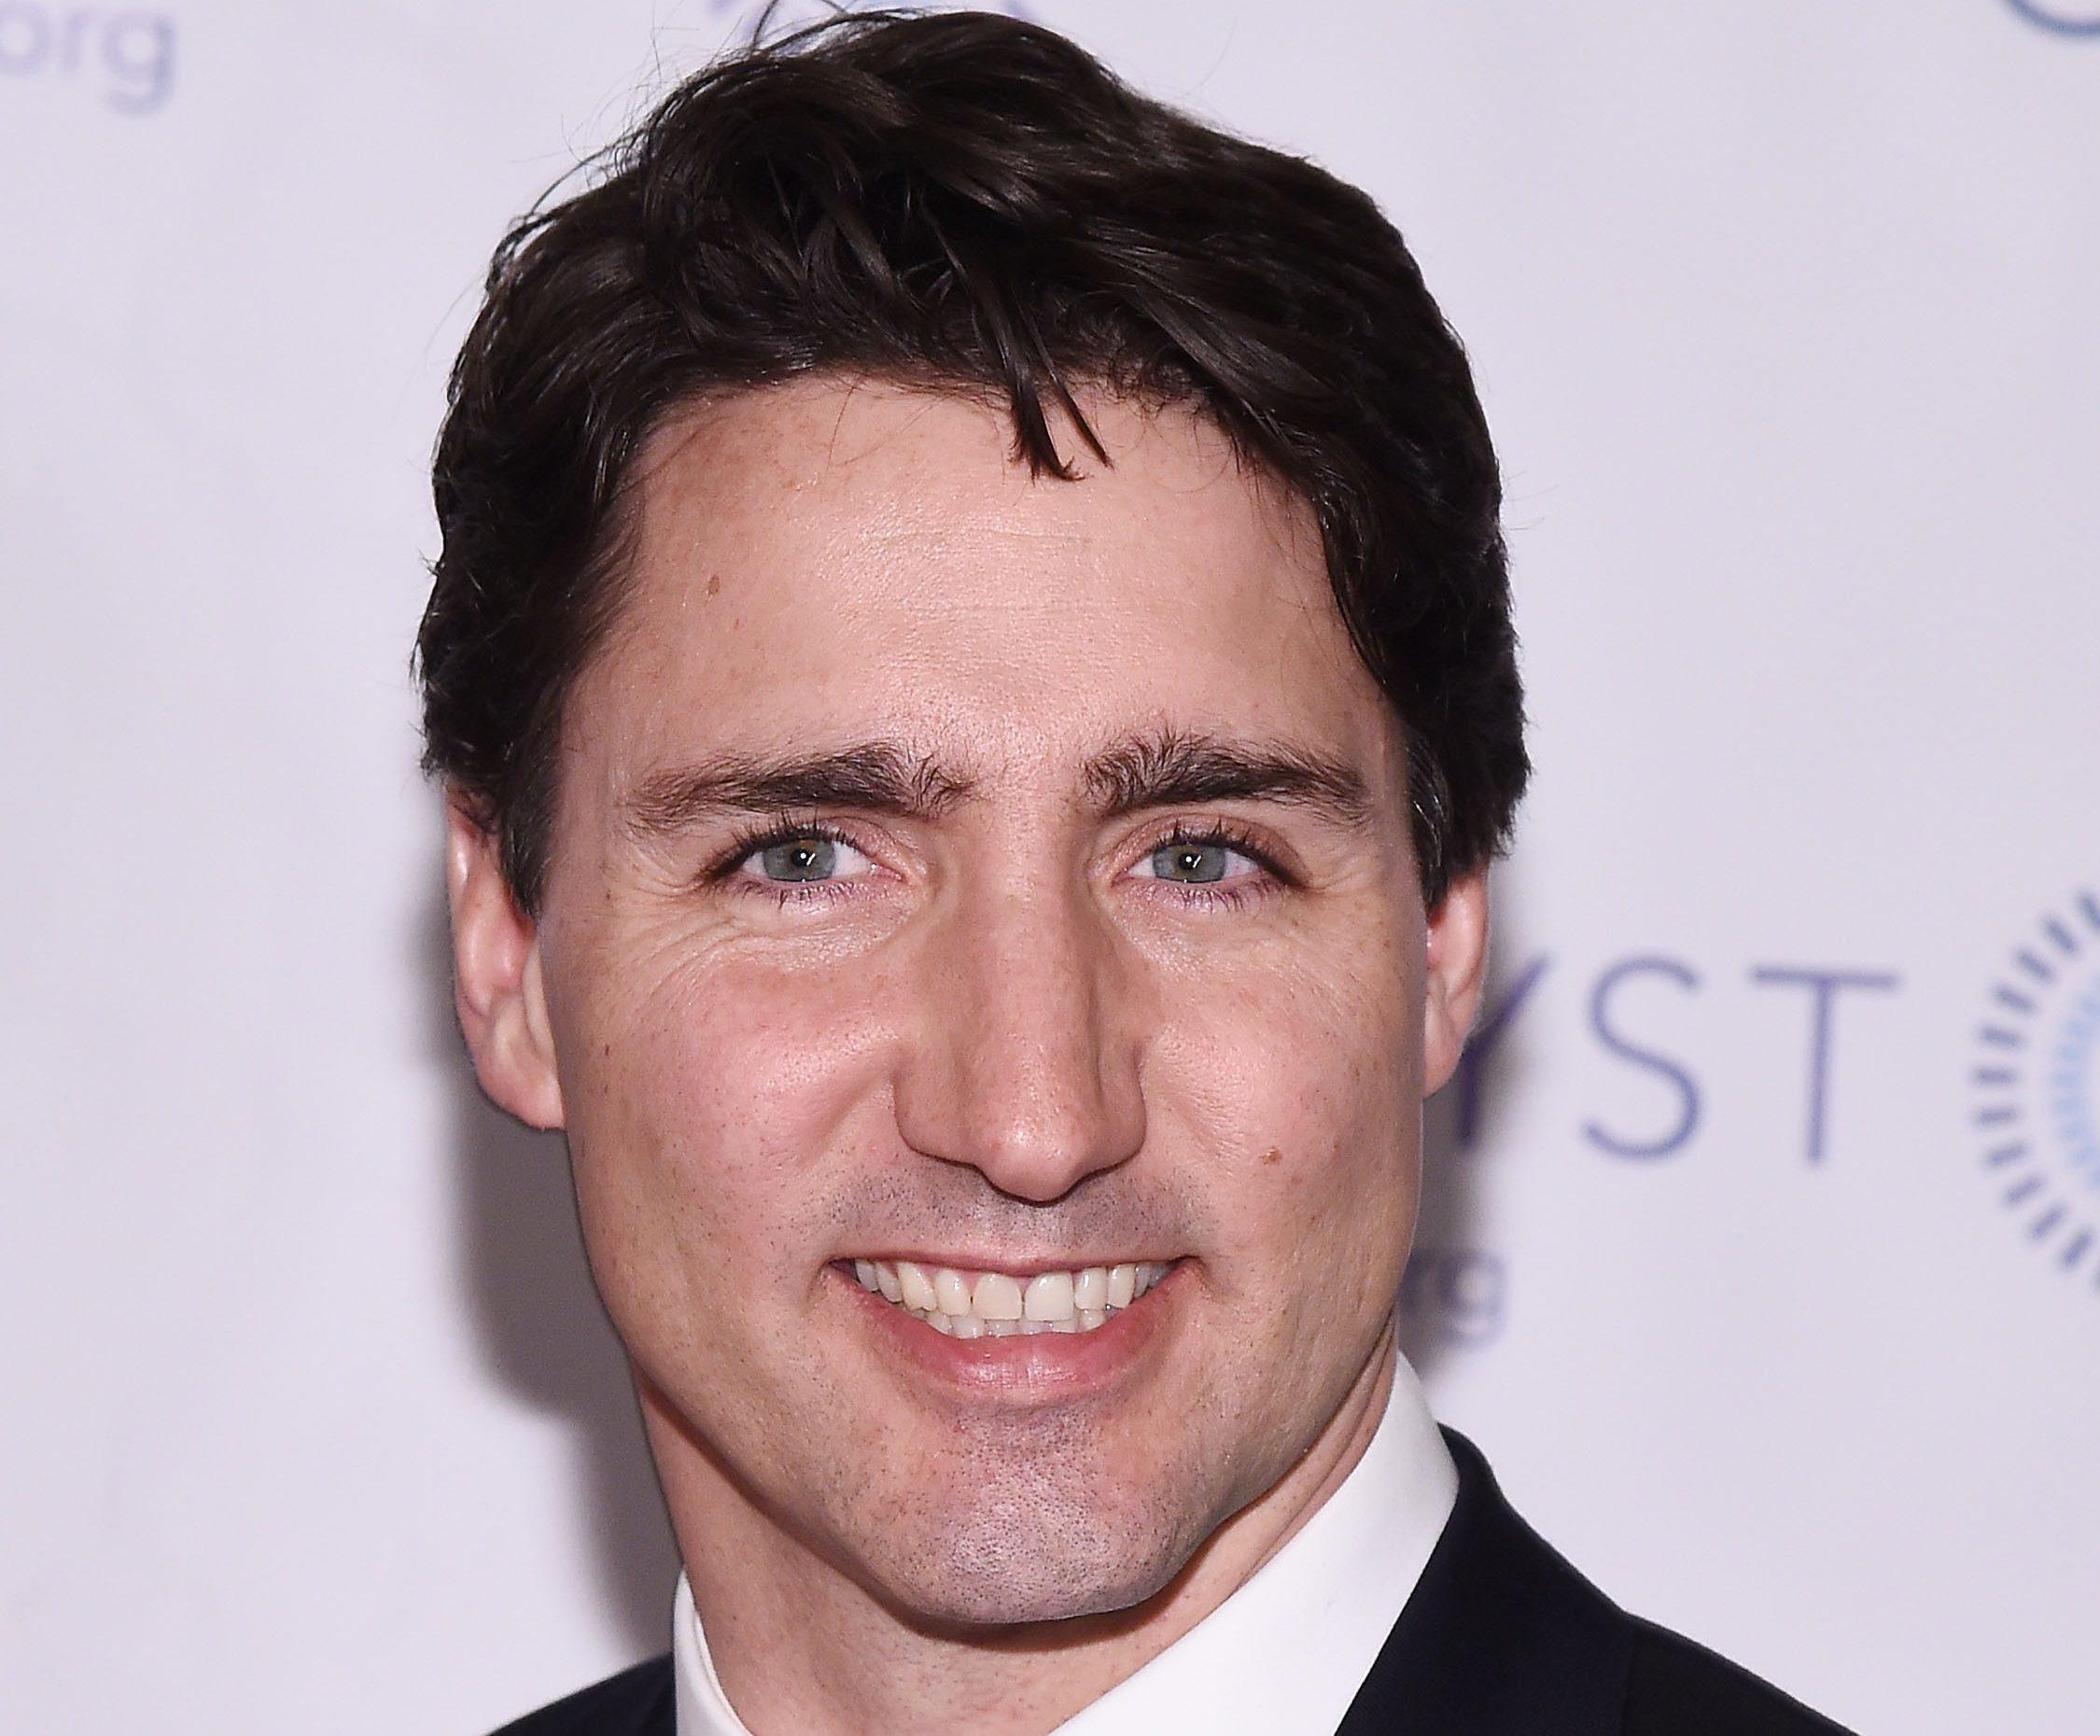 Canadian Prime Minister Justin Trudeau will arrive in Edinburgh next week (Ilya S. Savenok/Getty Images)